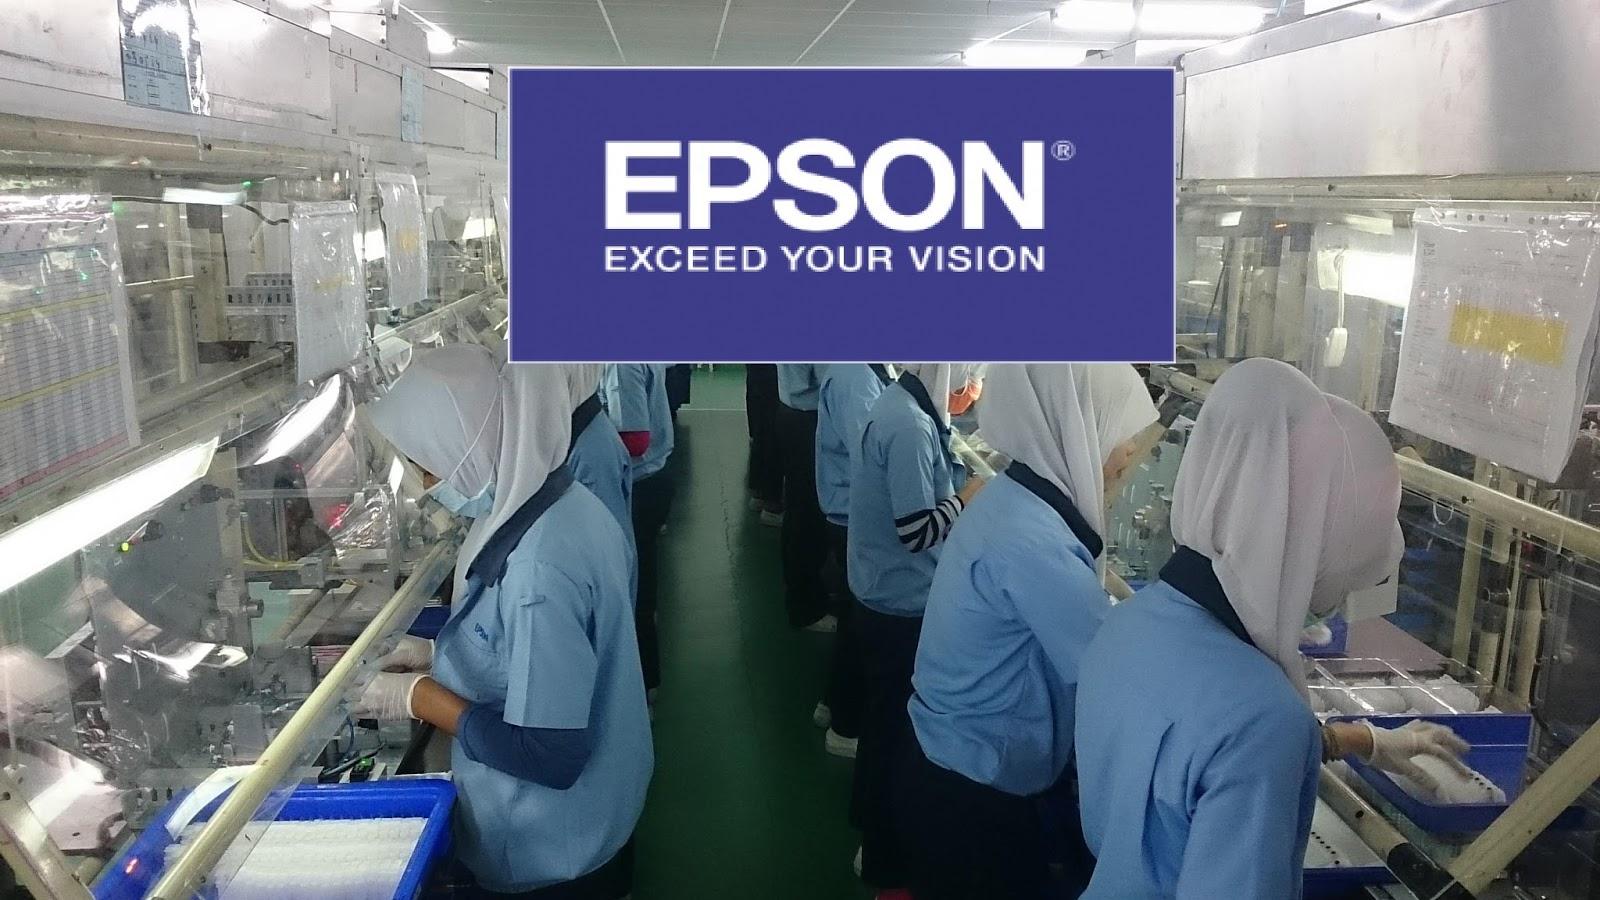 Loker Paling Terbaru Bulan Oktober 2018, Lowongan Kerja PT EPSON SMA SMK Sederajad